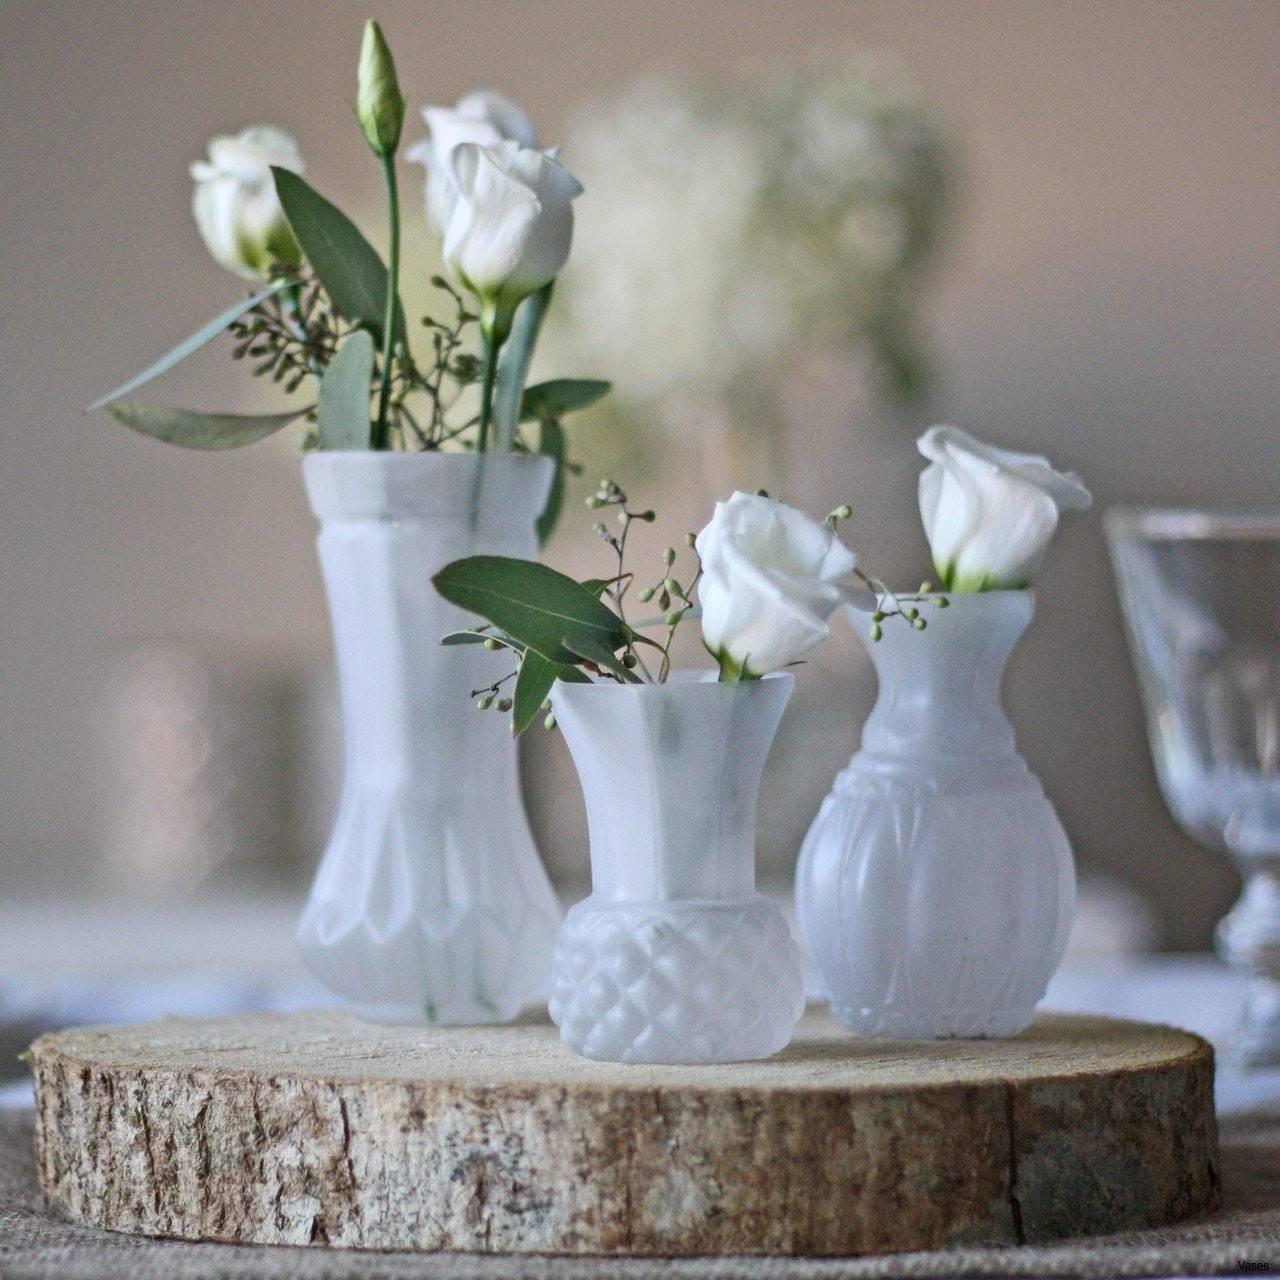 wedding sand vase of pictures of wedding reception tables luxury jar flower 1h vases bud throughout pictures of wedding reception tables luxury jar flower 1h vases bud wedding vase centerpiece idea i